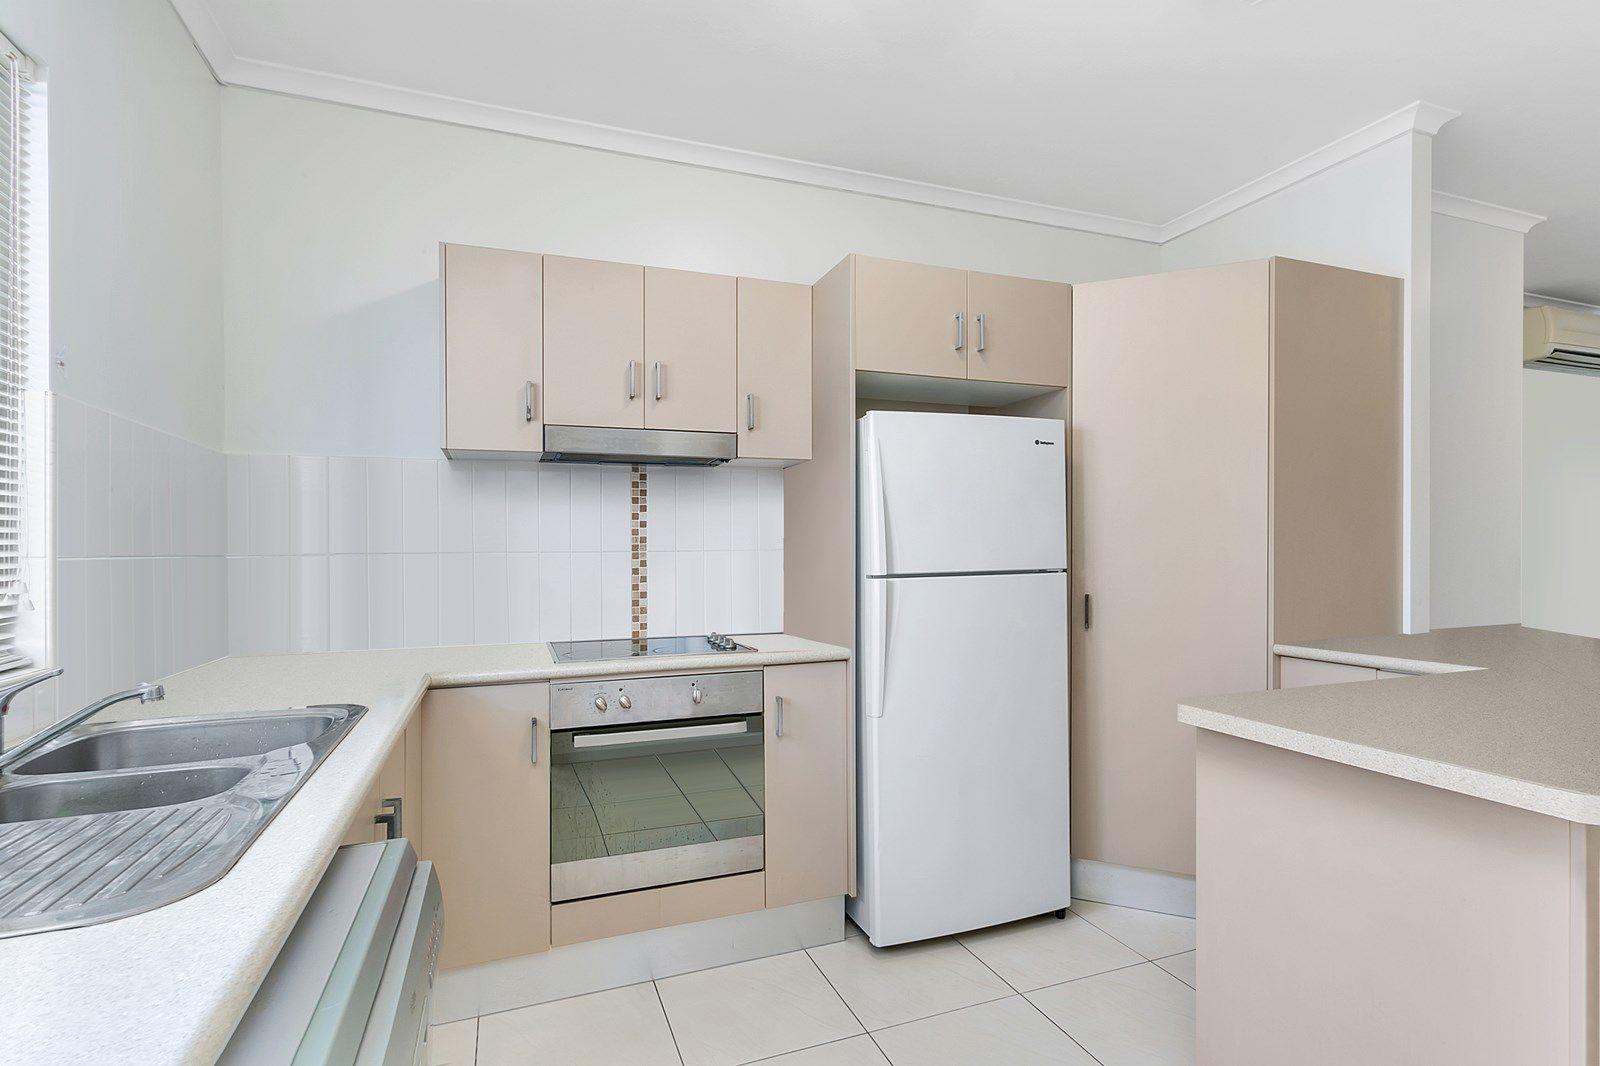 19/376-384 Severin Street, Parramatta Park QLD 4870, Image 2